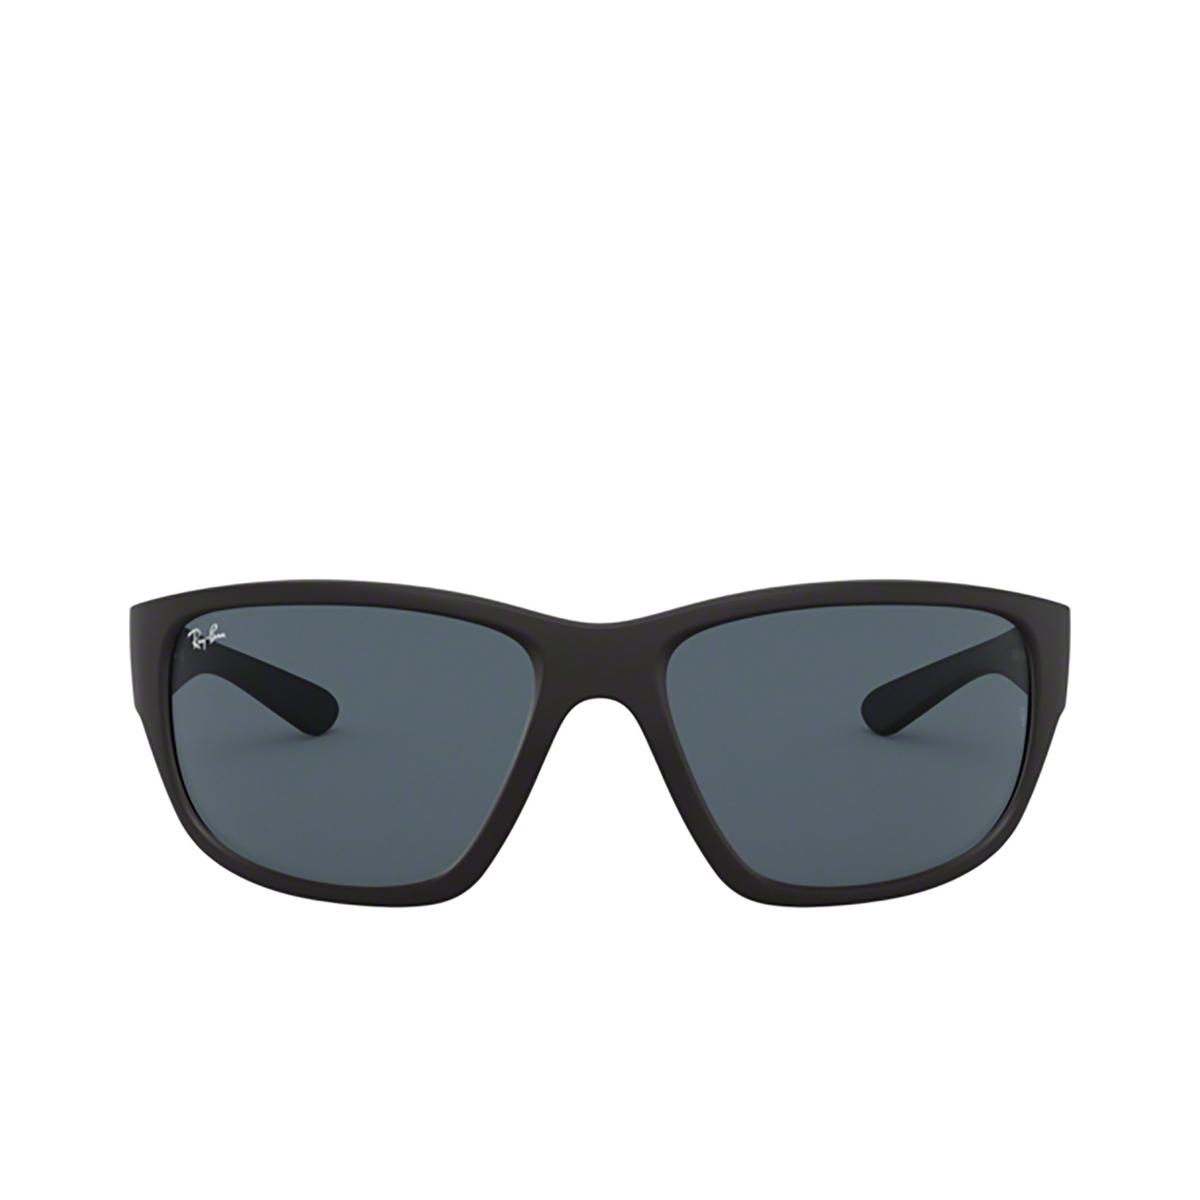 Ray-Ban® Square Sunglasses: RB4300 color Matte Black 601SR5 - 1/3.